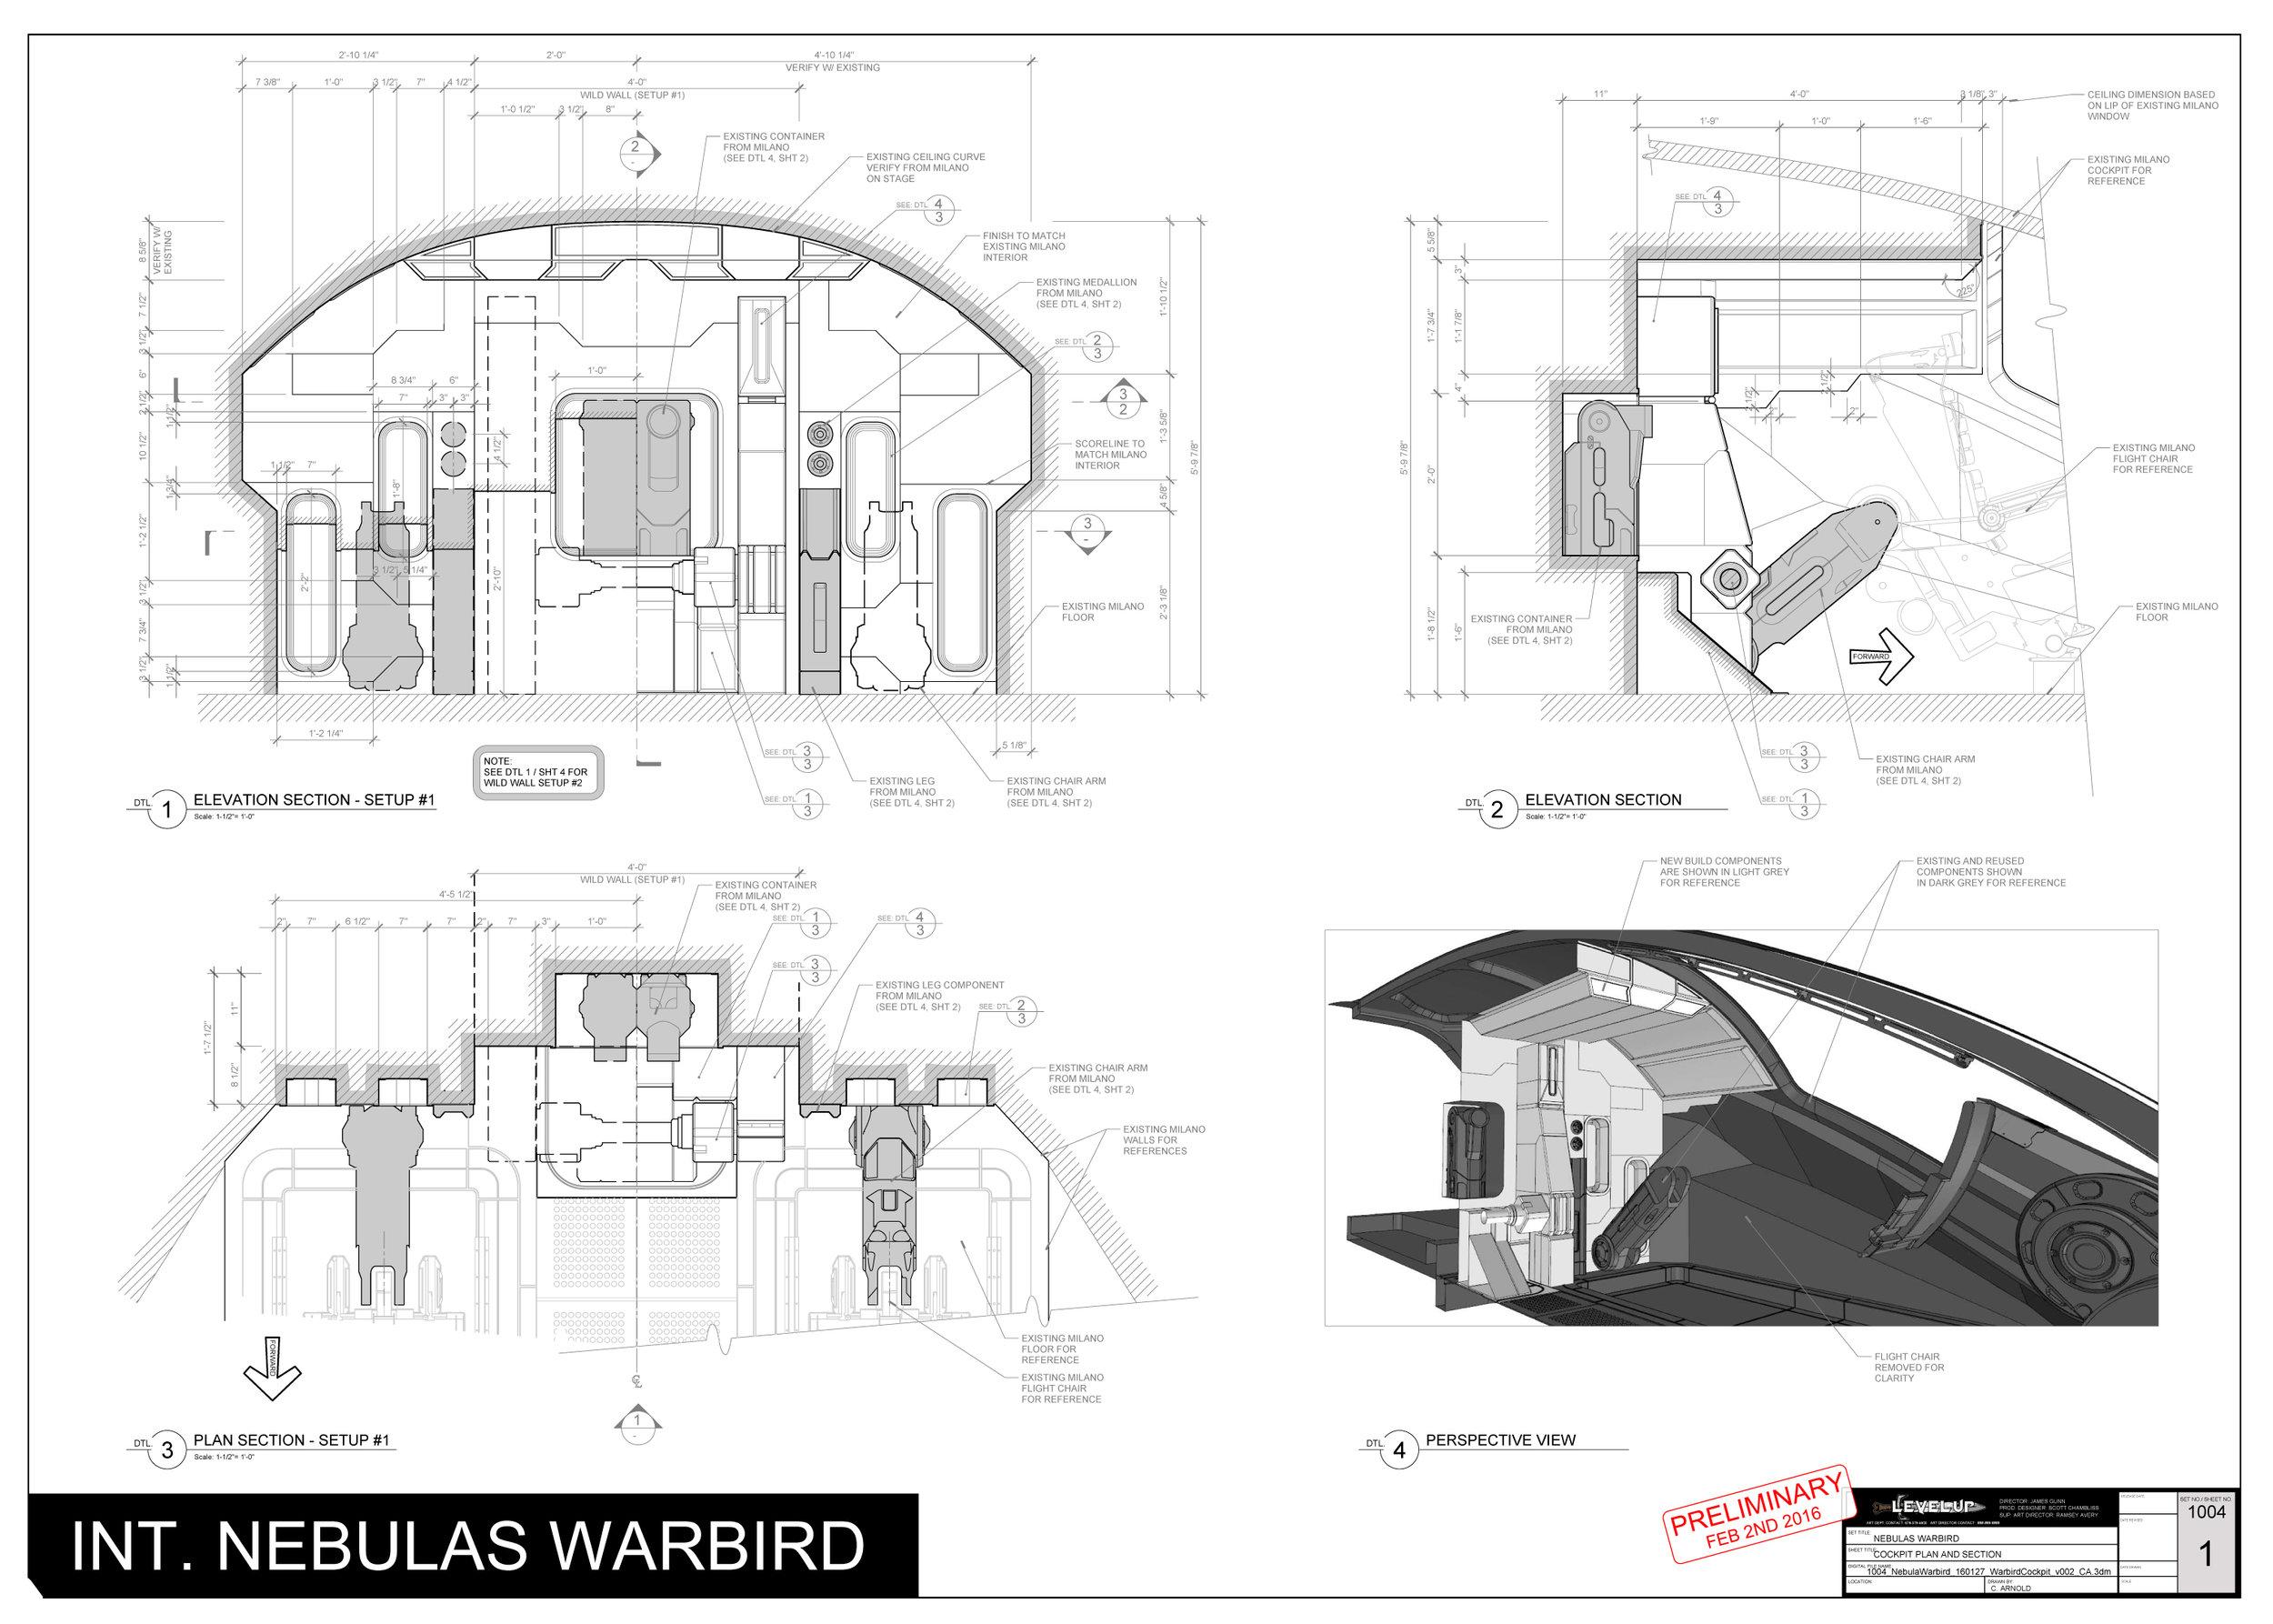 1004_NebulaWarbird_SHT-1_160202_WarbirdCockpit_v002_CA.jpg